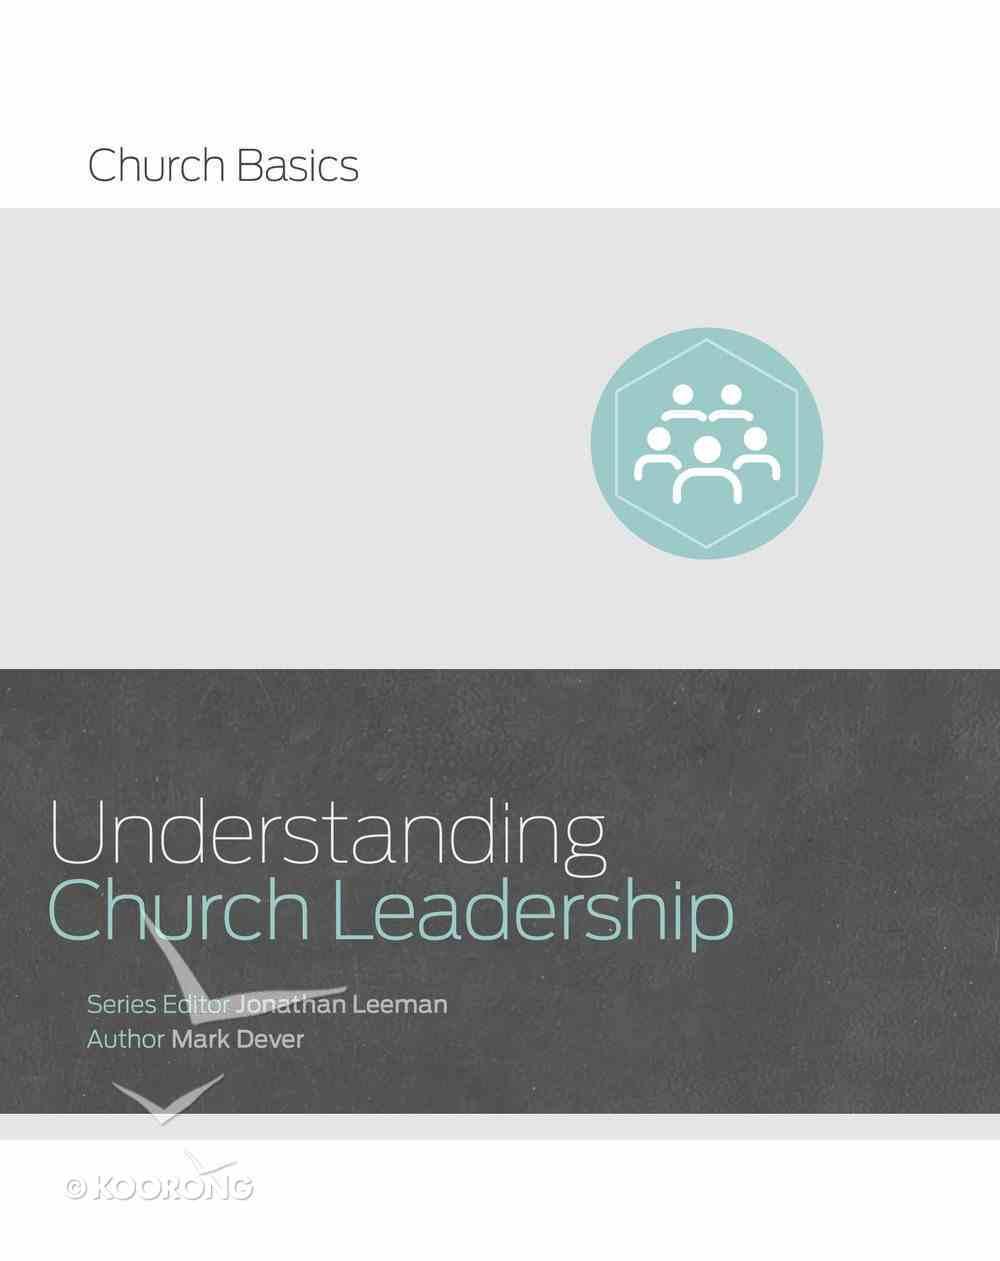 Understanding Church Leadership (Church Basics Series) Paperback